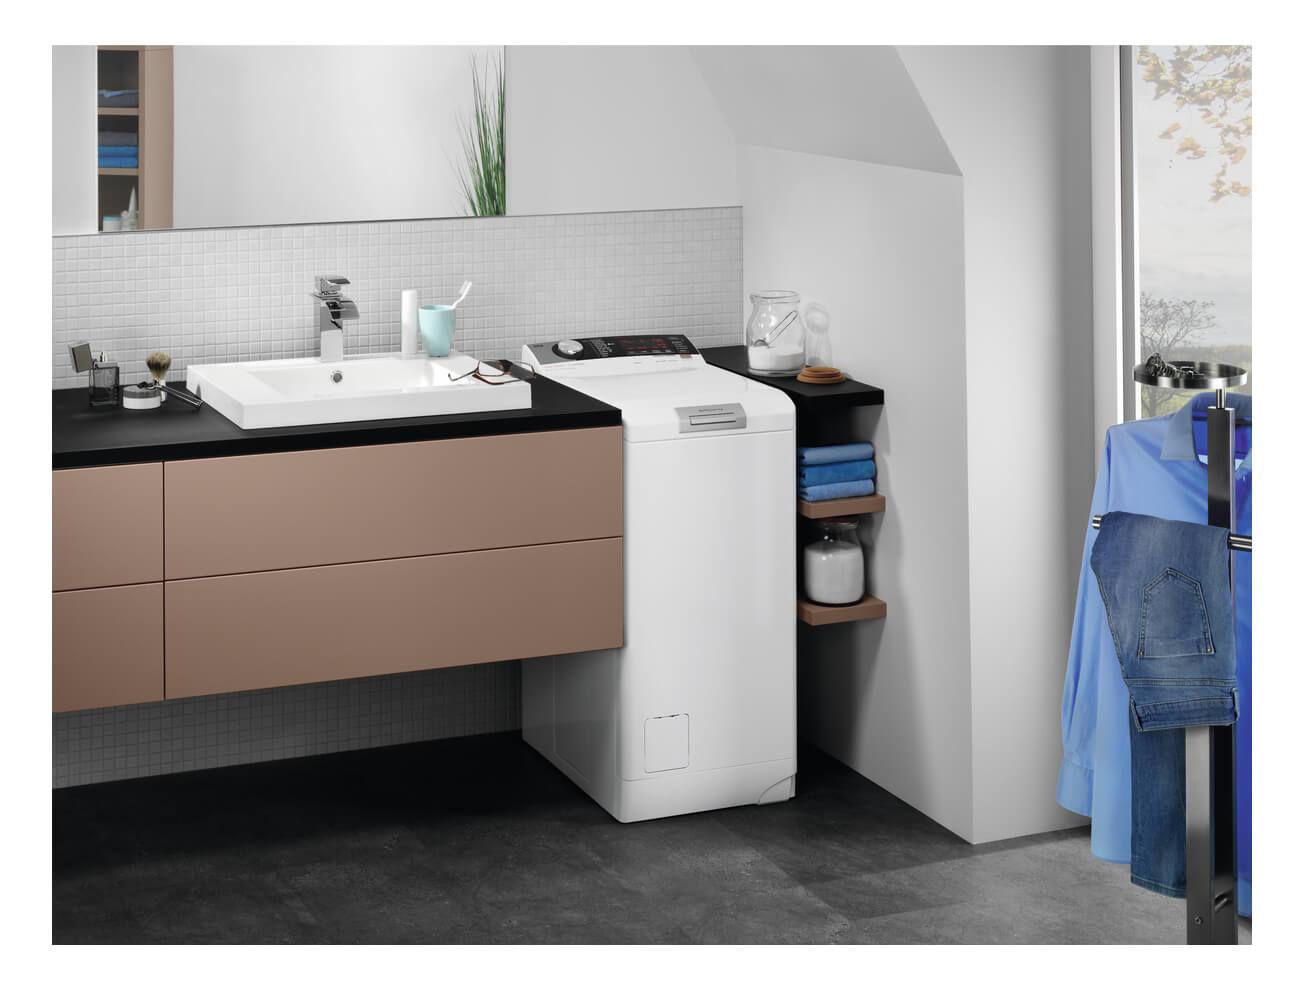 Electrolux wagl5t300 waschmaschine nettoshop.ch